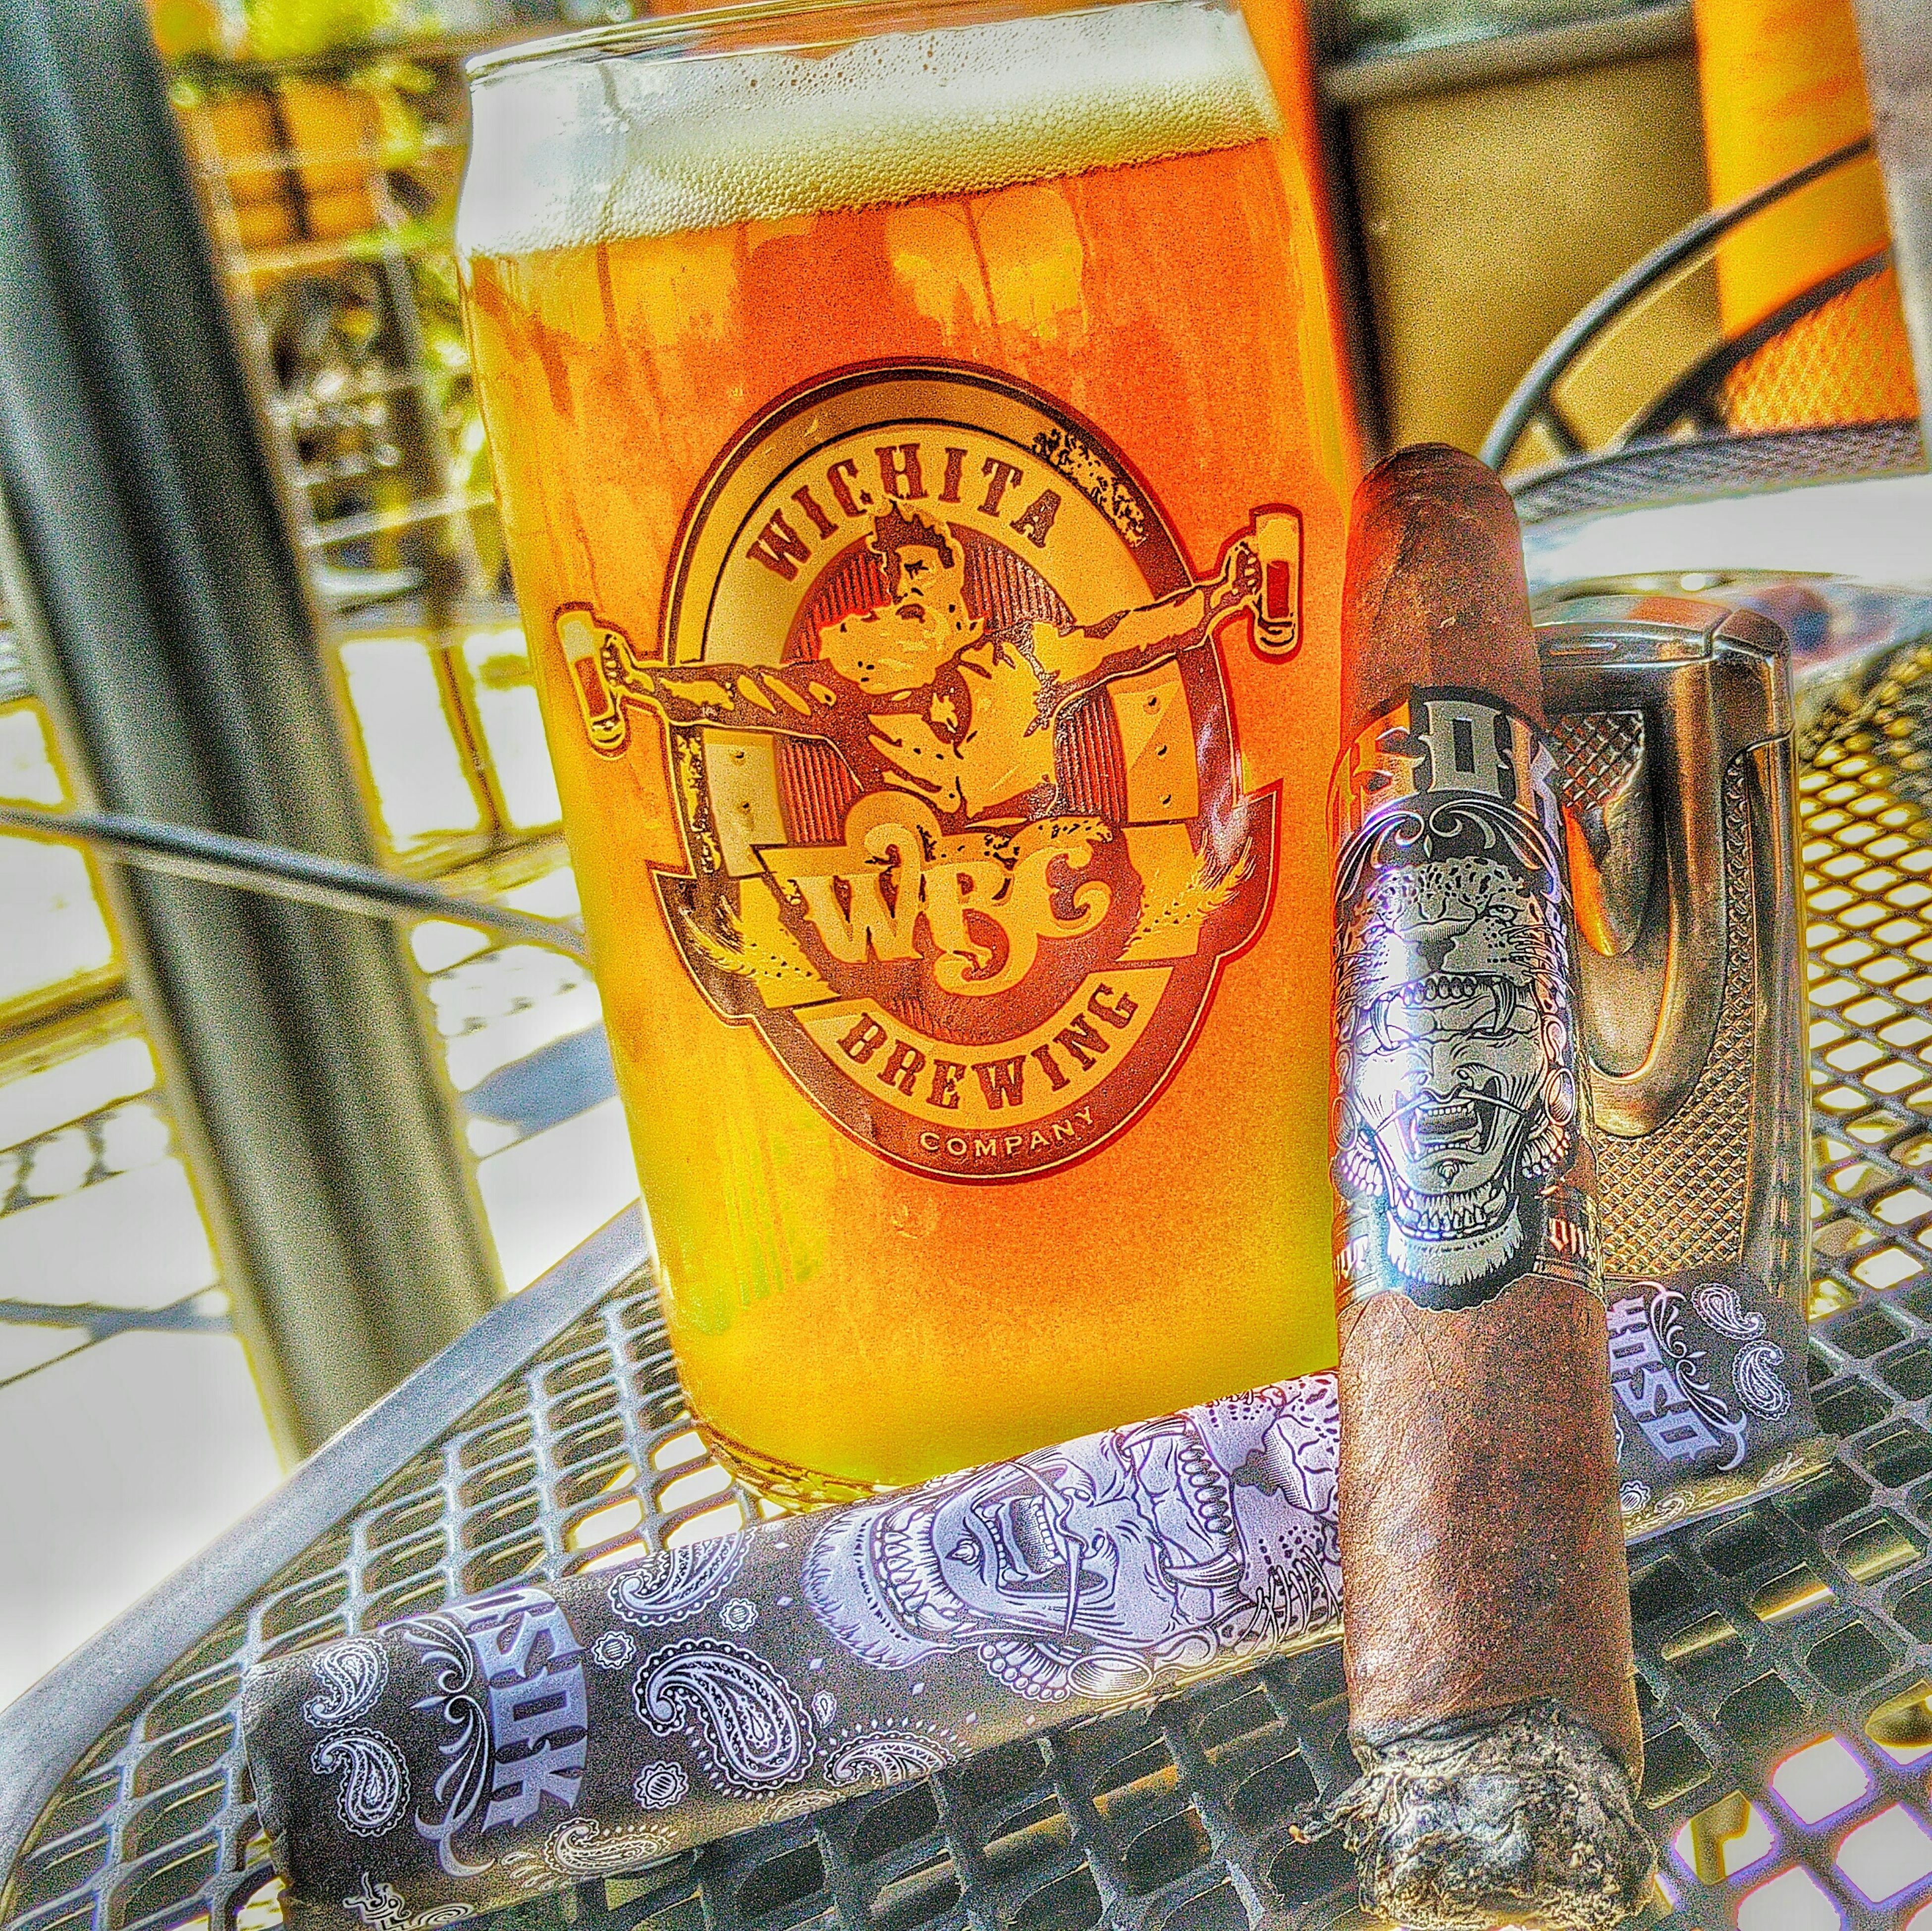 Beautiful afternoon at @wichitabrew EastSide Craftbeer Cigars OSoK